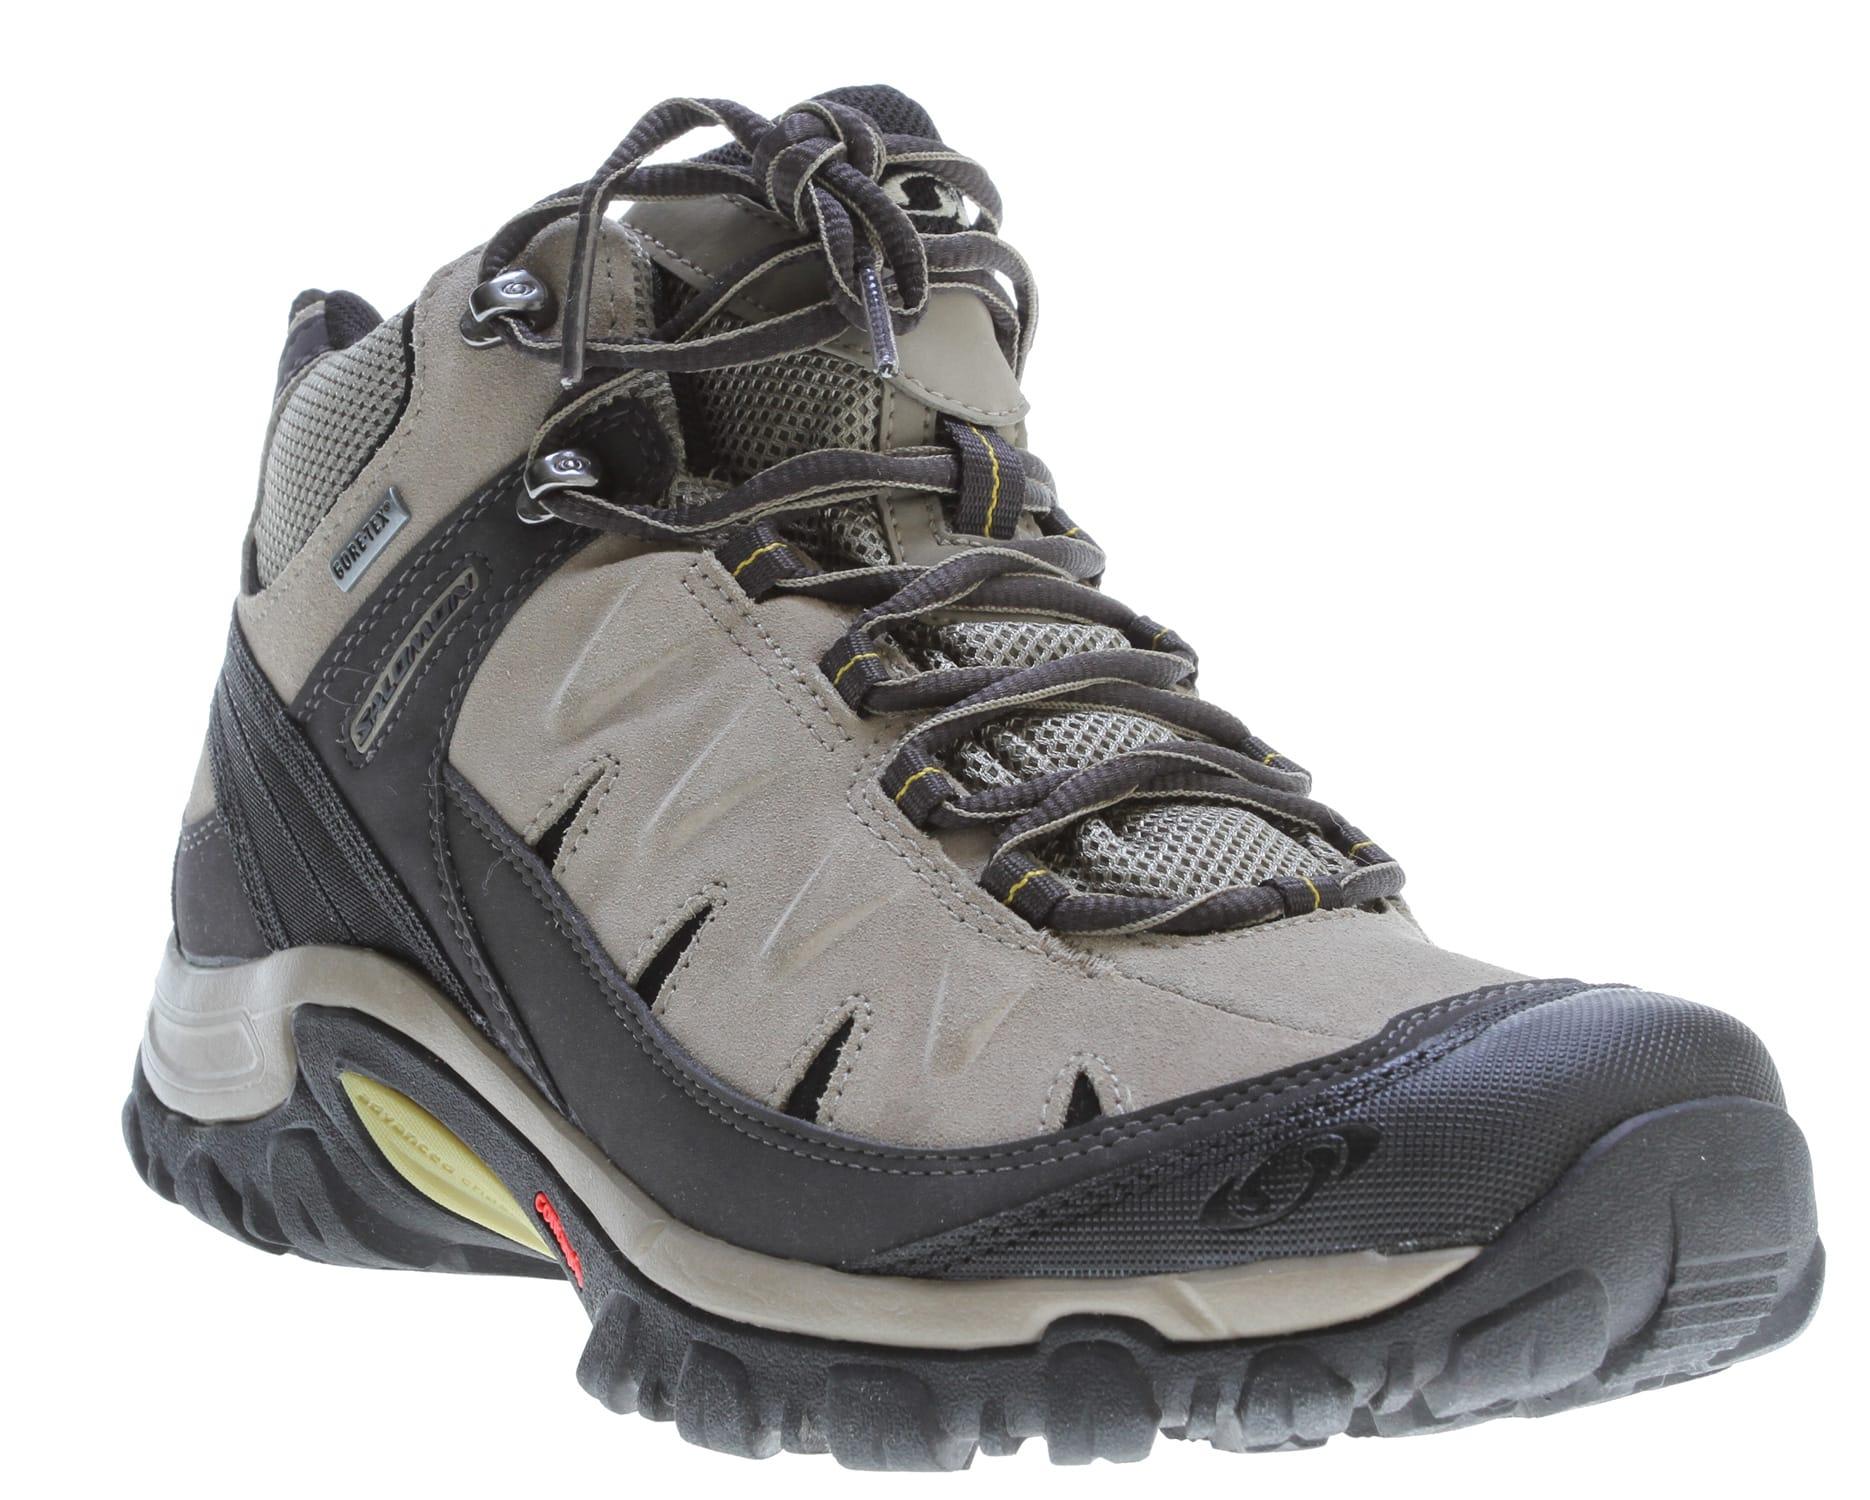 Salomon Exit Peak Mid 2 GTX Hiking Shoes